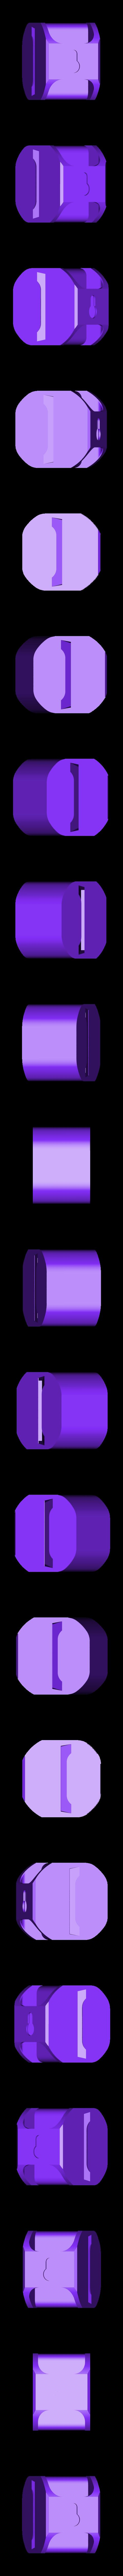 Watch_Lens_02_-_Bracket.STL Download free STL file Watch Magnifier • Design to 3D print, CWandT